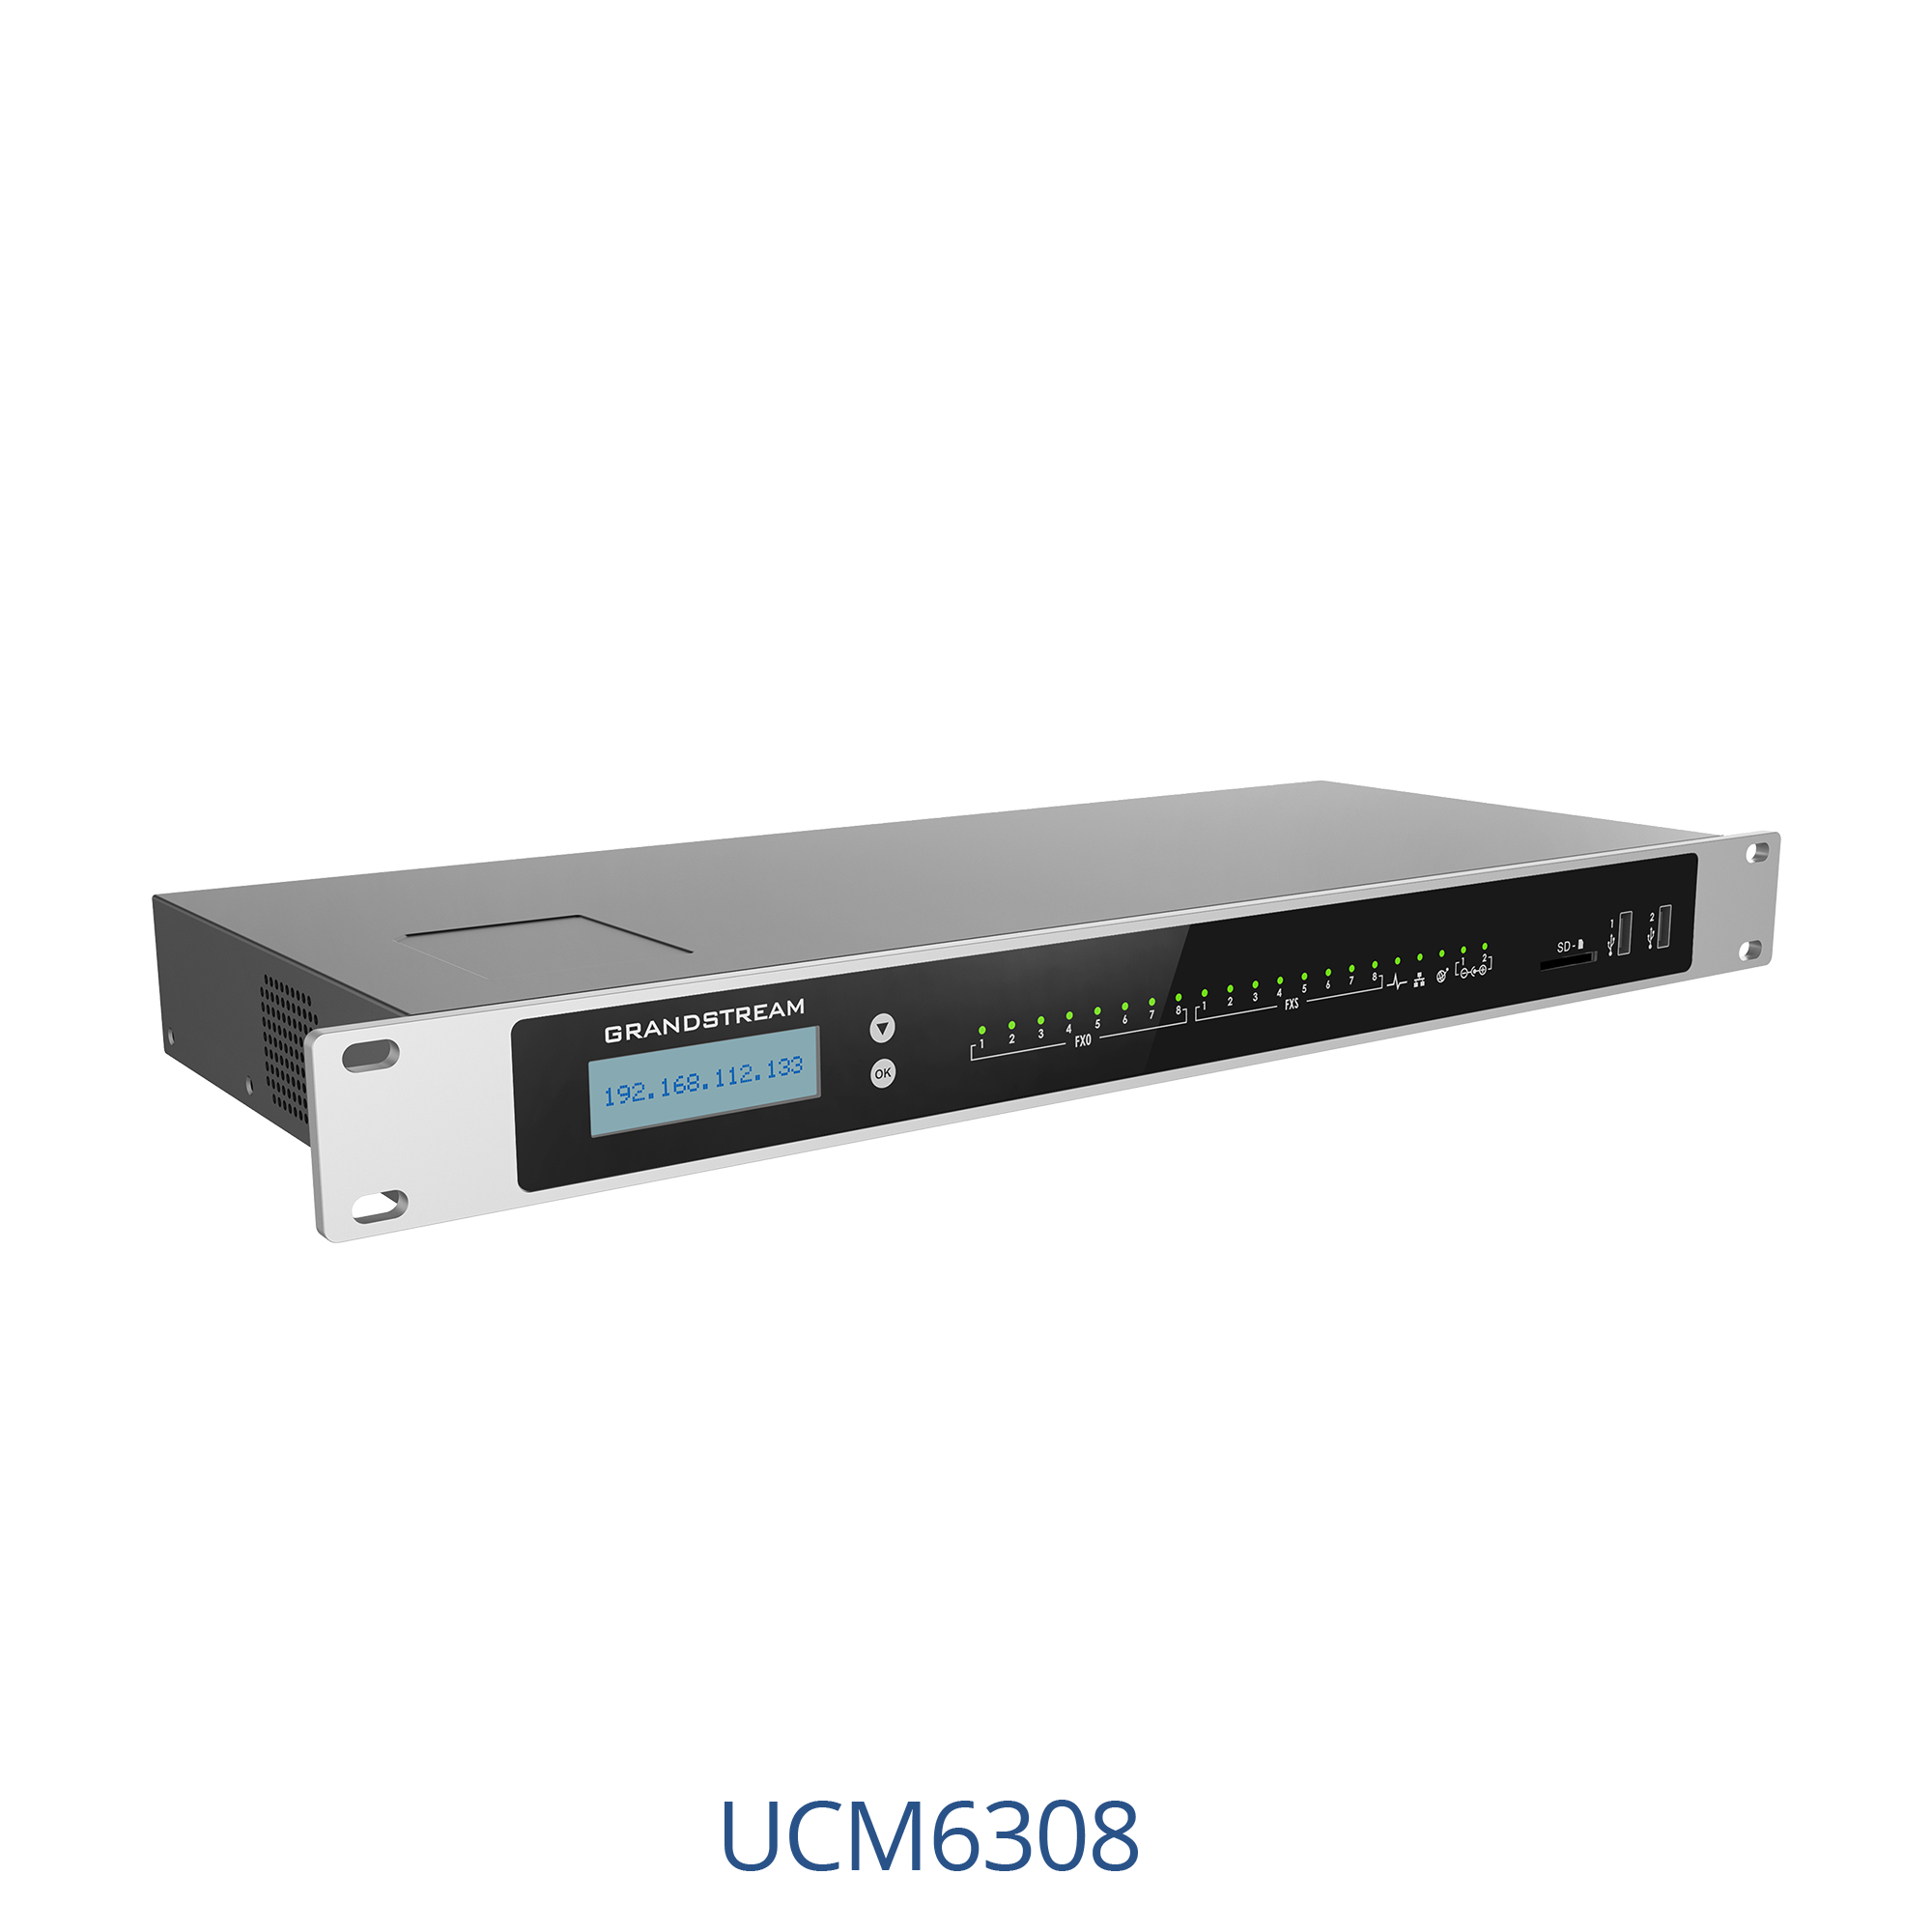 UCM6308